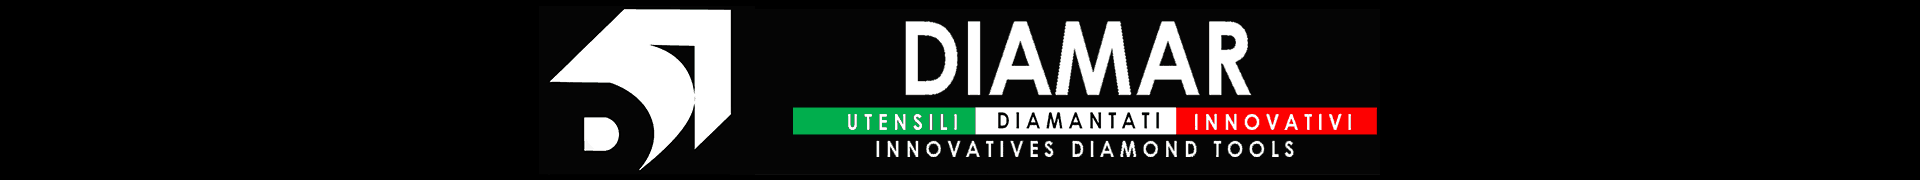 Diamar utensili elettrodeposti - Logo Wide